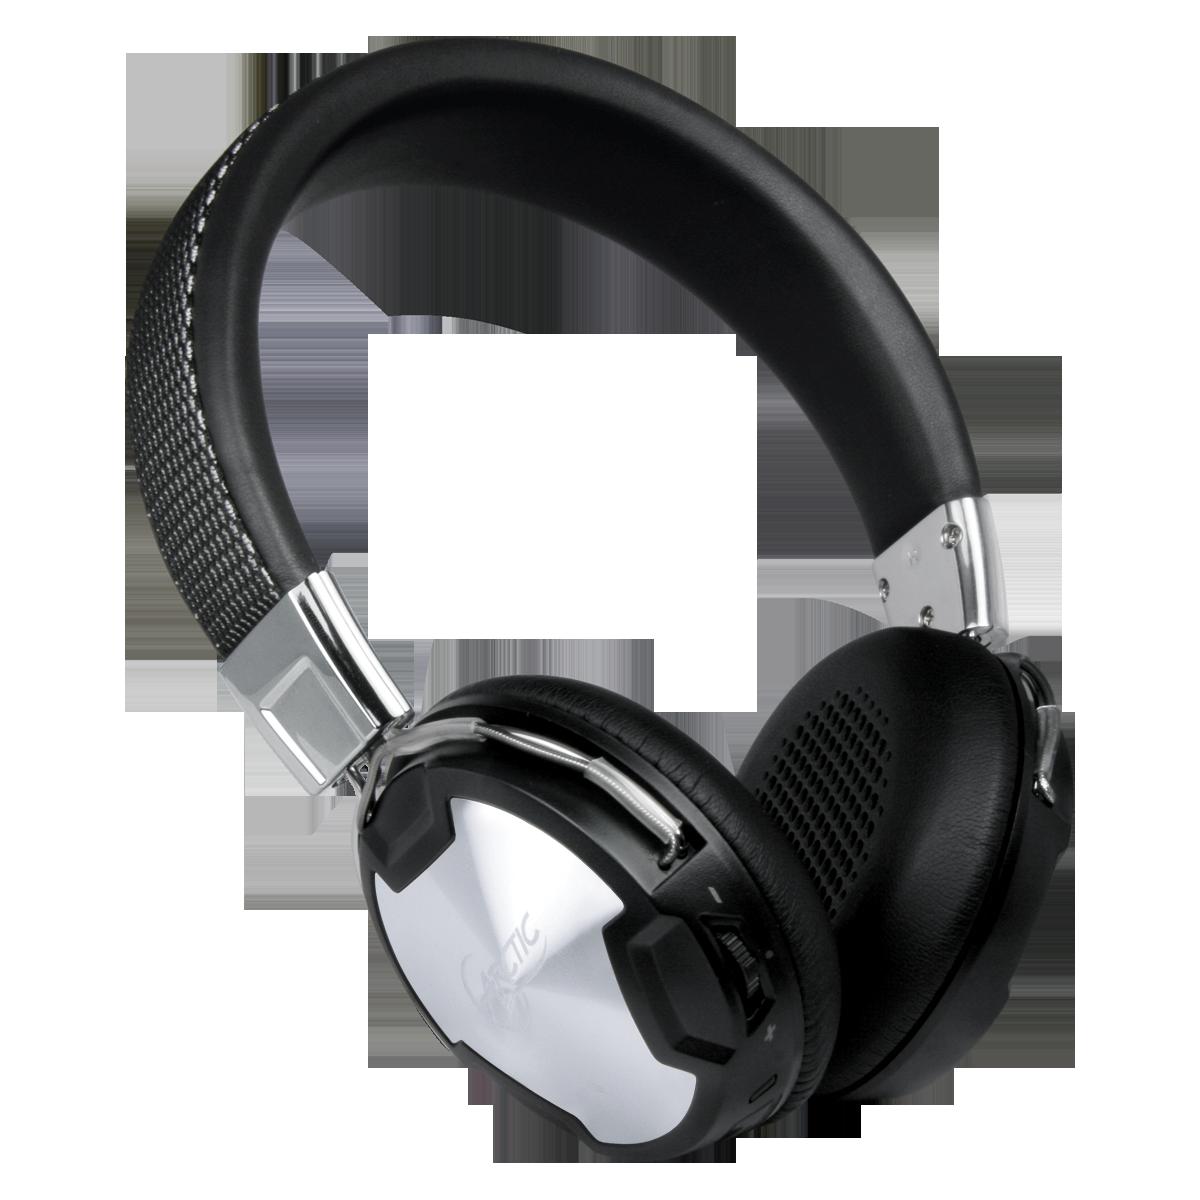 Bluetooth 4.0 Headphones with Microphone ARCTIC P614 BT